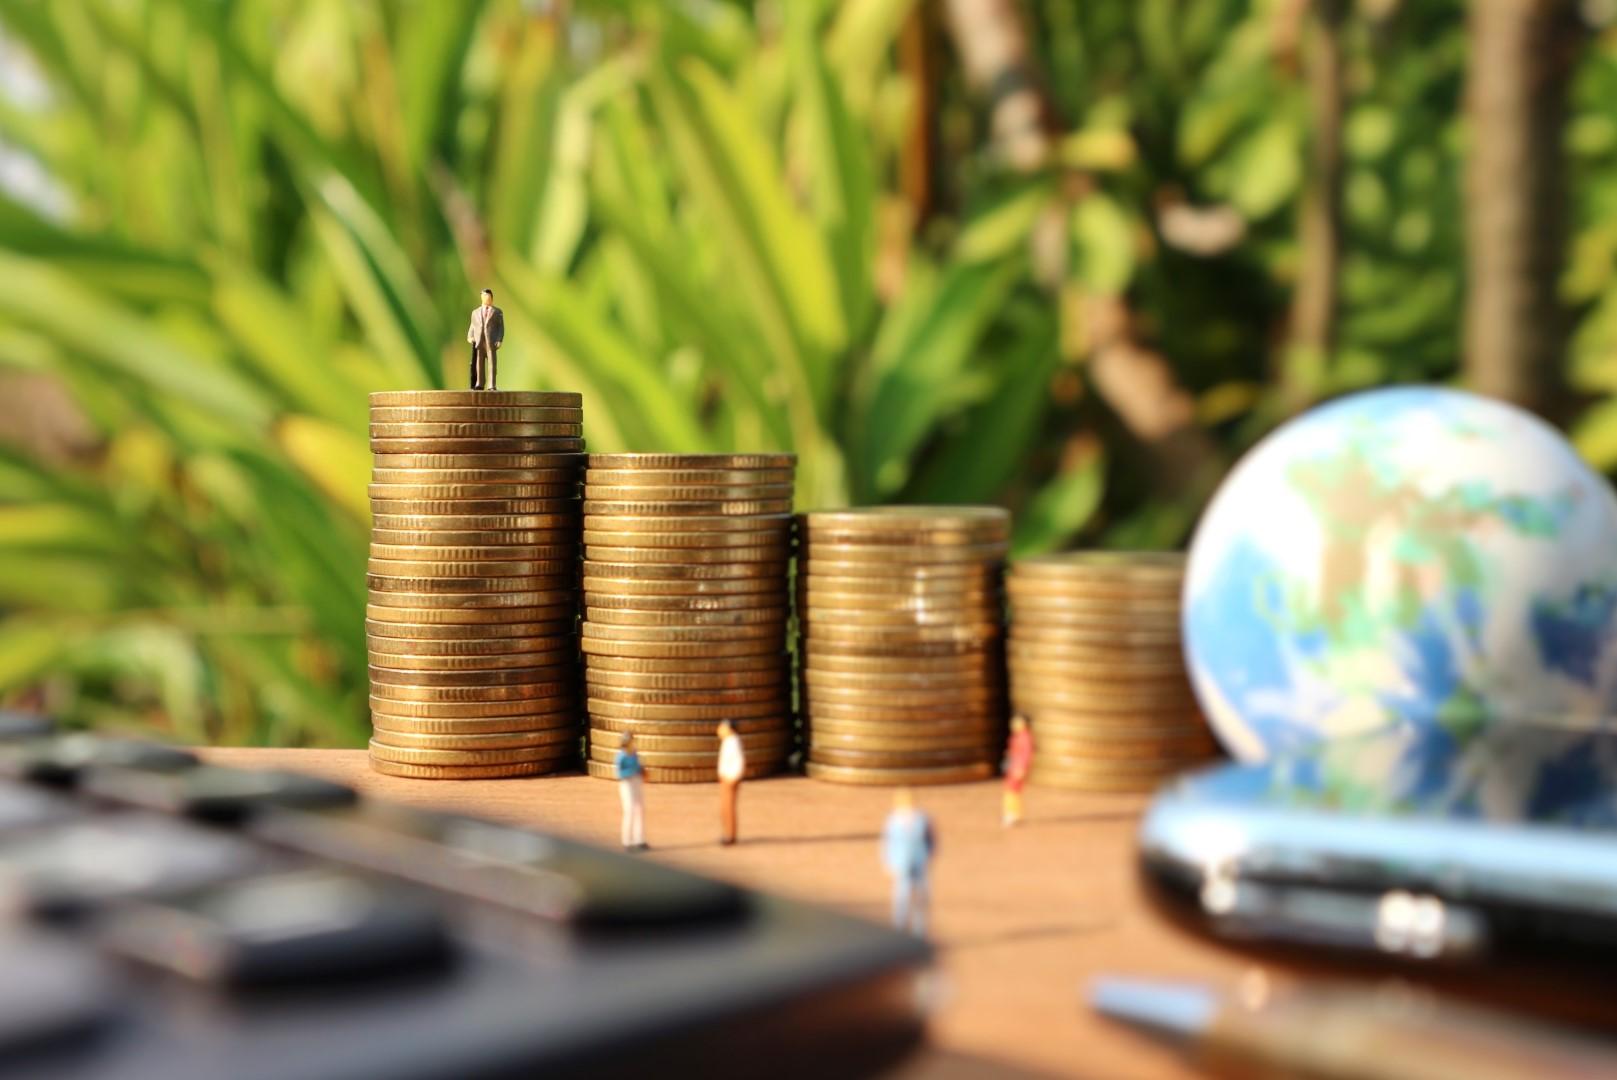 Sonata Software Q1 sequential revenue up 25%